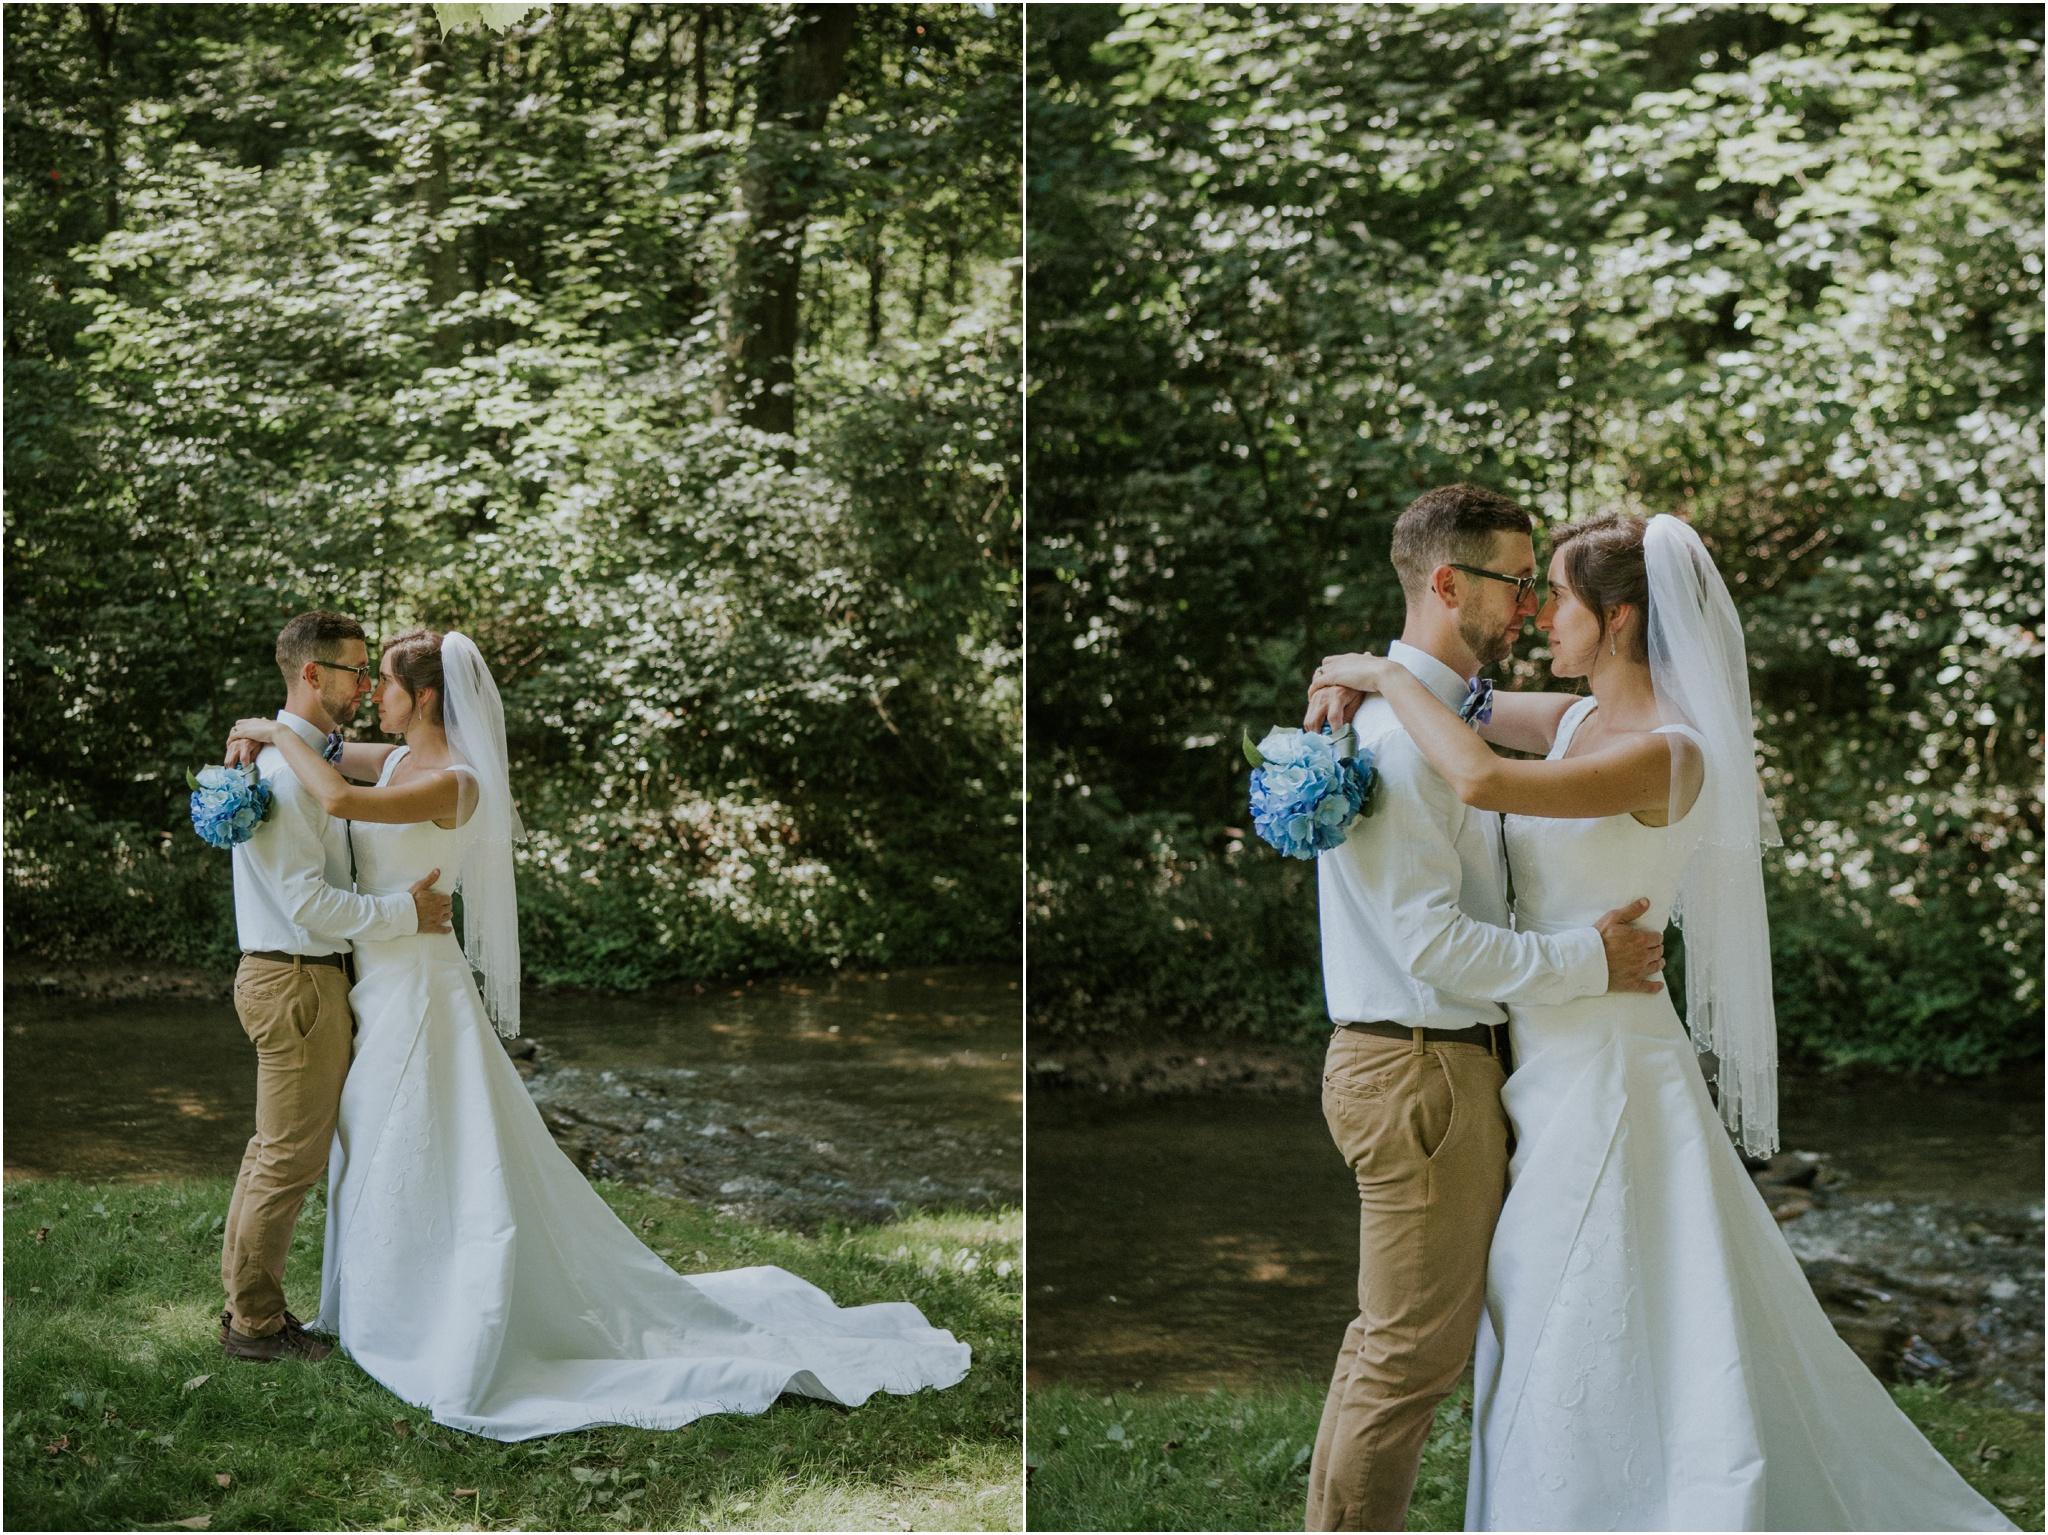 sugar-hollow-park-bristol-virginia-wedding-intimate-woodsy-black-forest-ceremony-adventurous-couple_0054.jpg